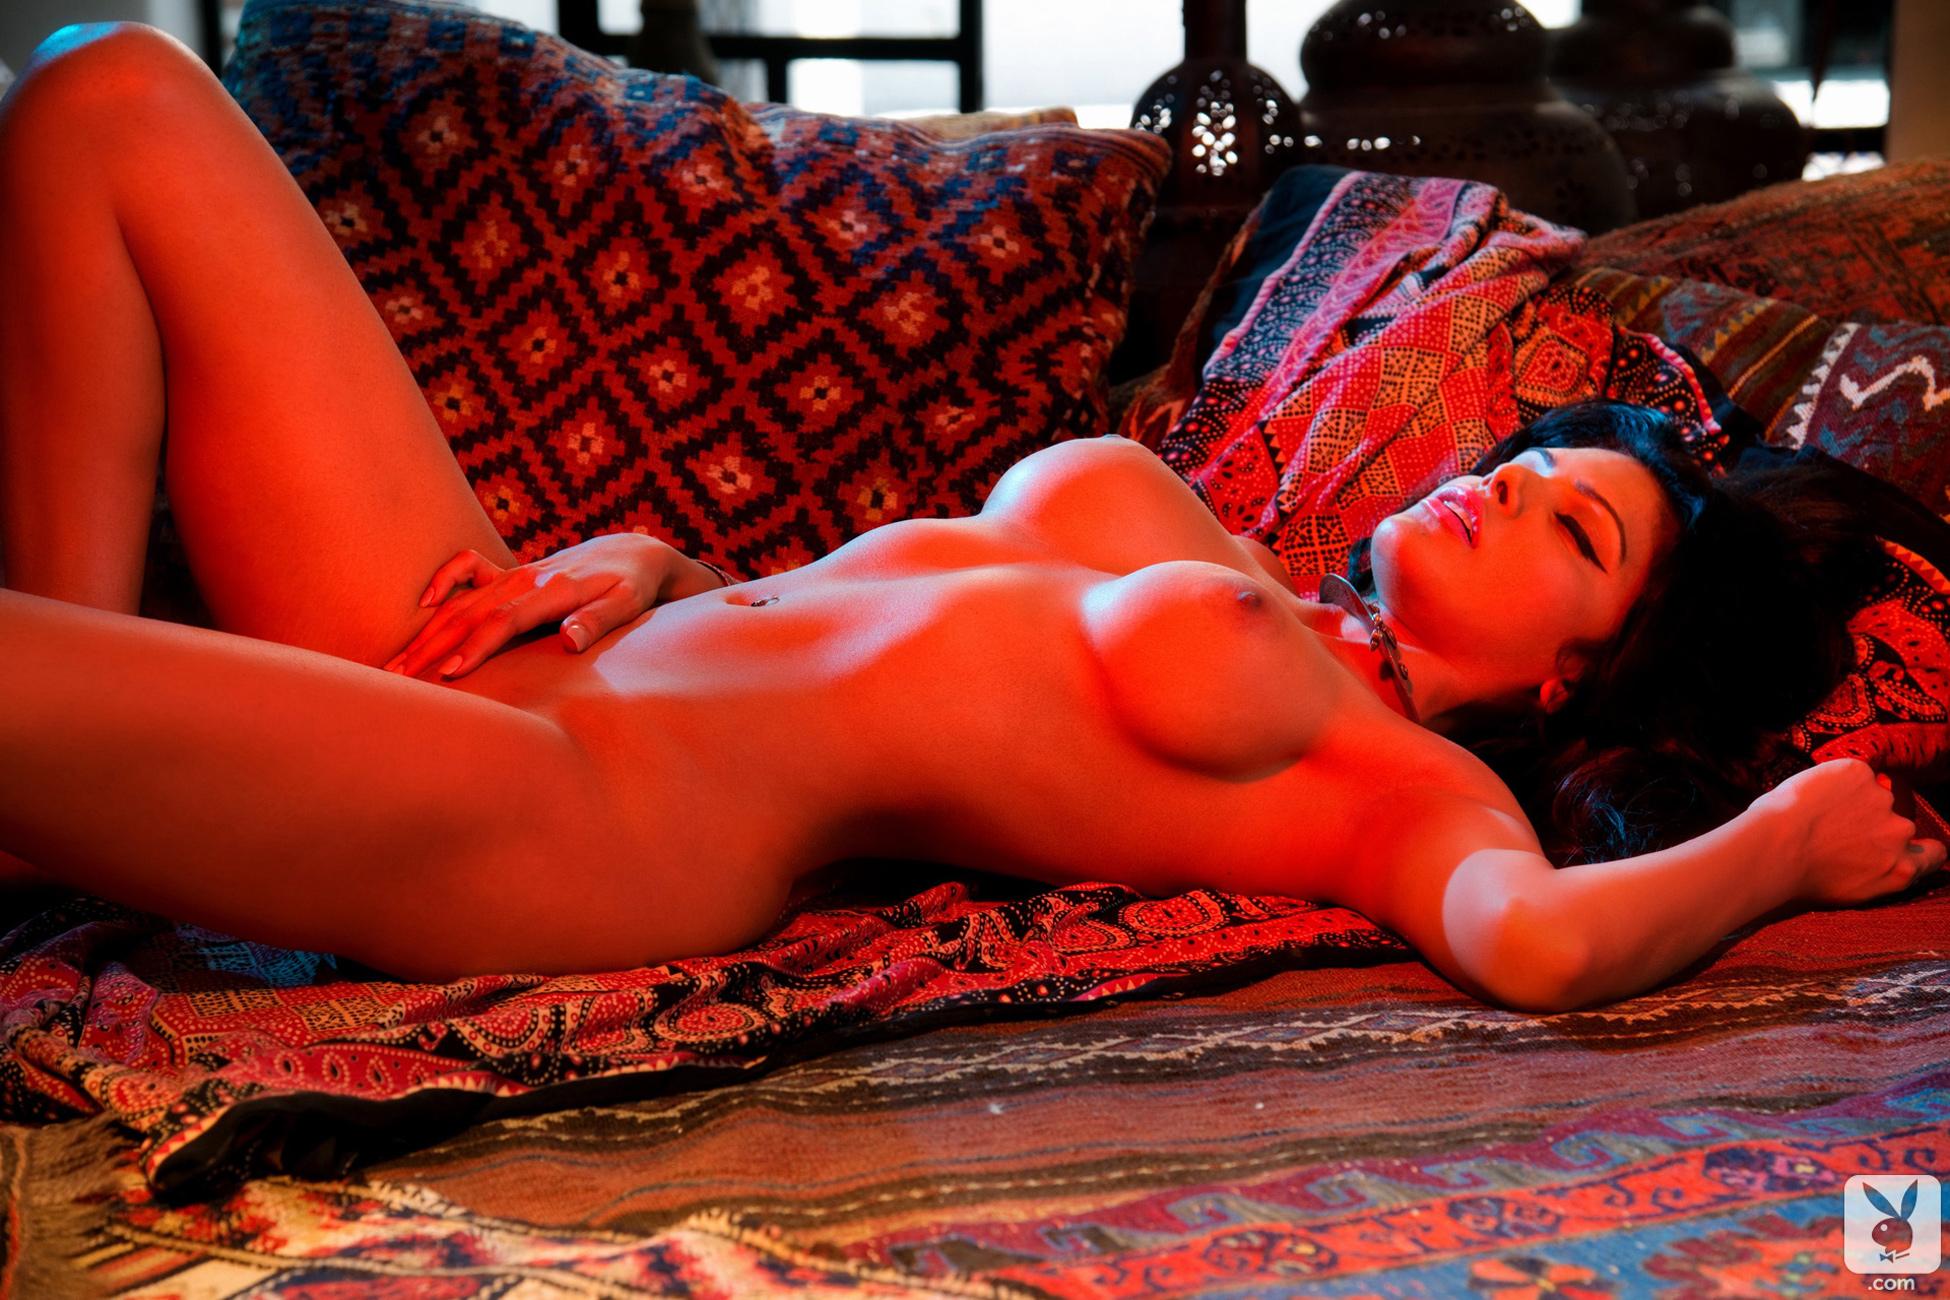 Playboy nude 3d photos naked video